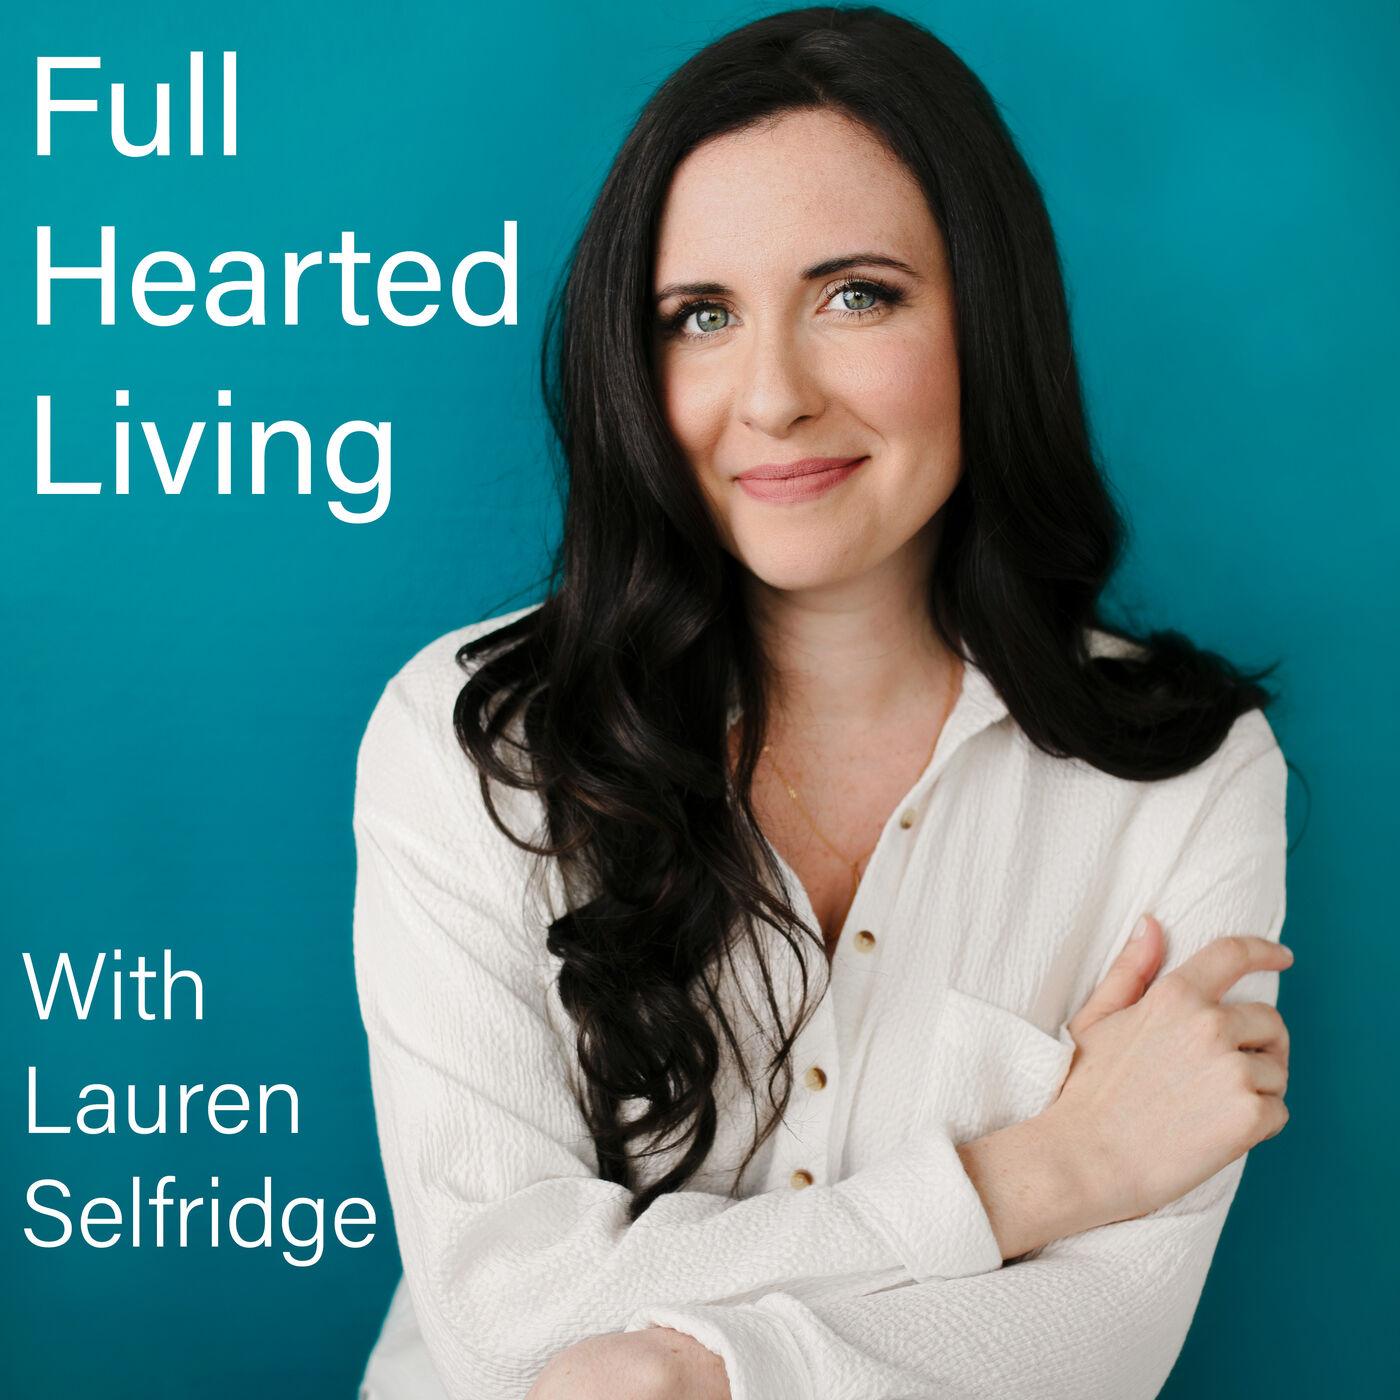 Full-Hearted Living with Lauren Selfridge